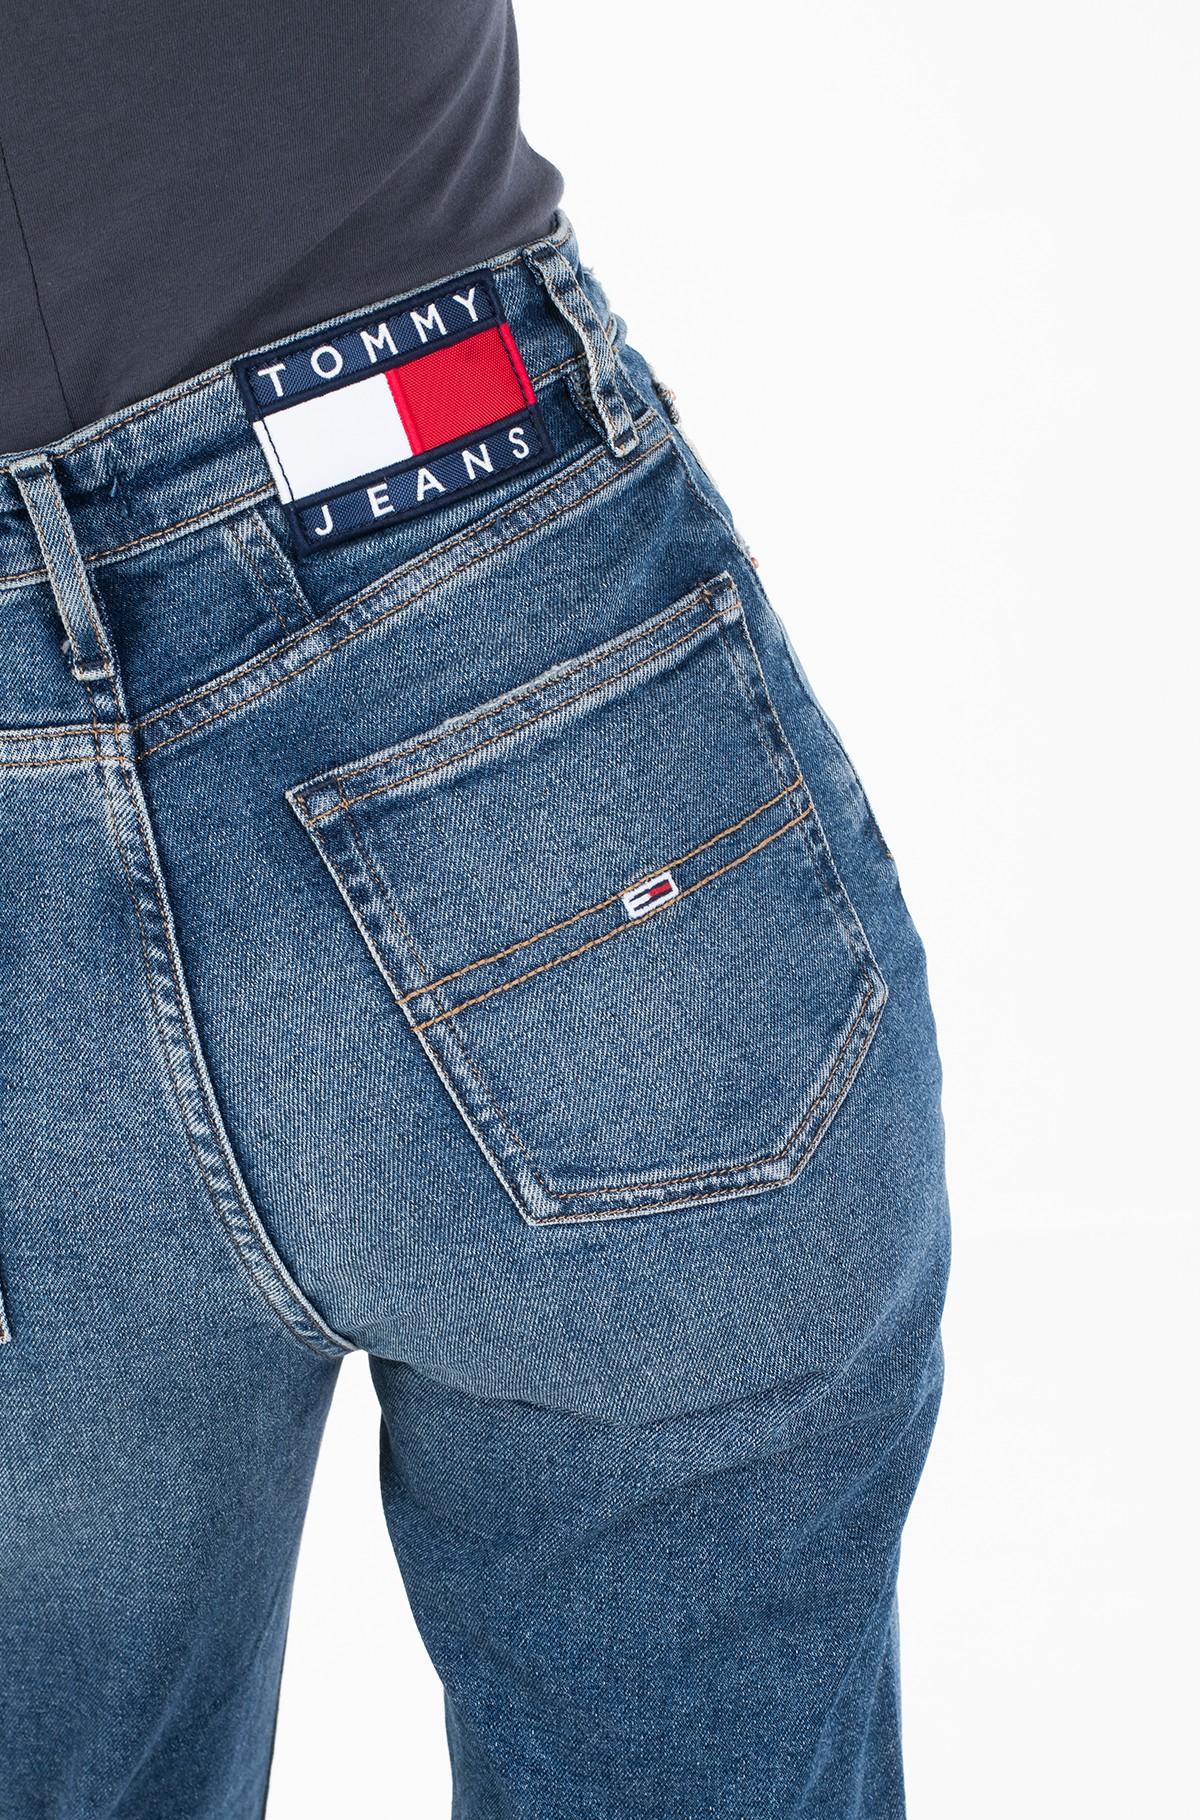 Jeans HIGH RISE TAPERED TJ 2004 BTSM-full-4